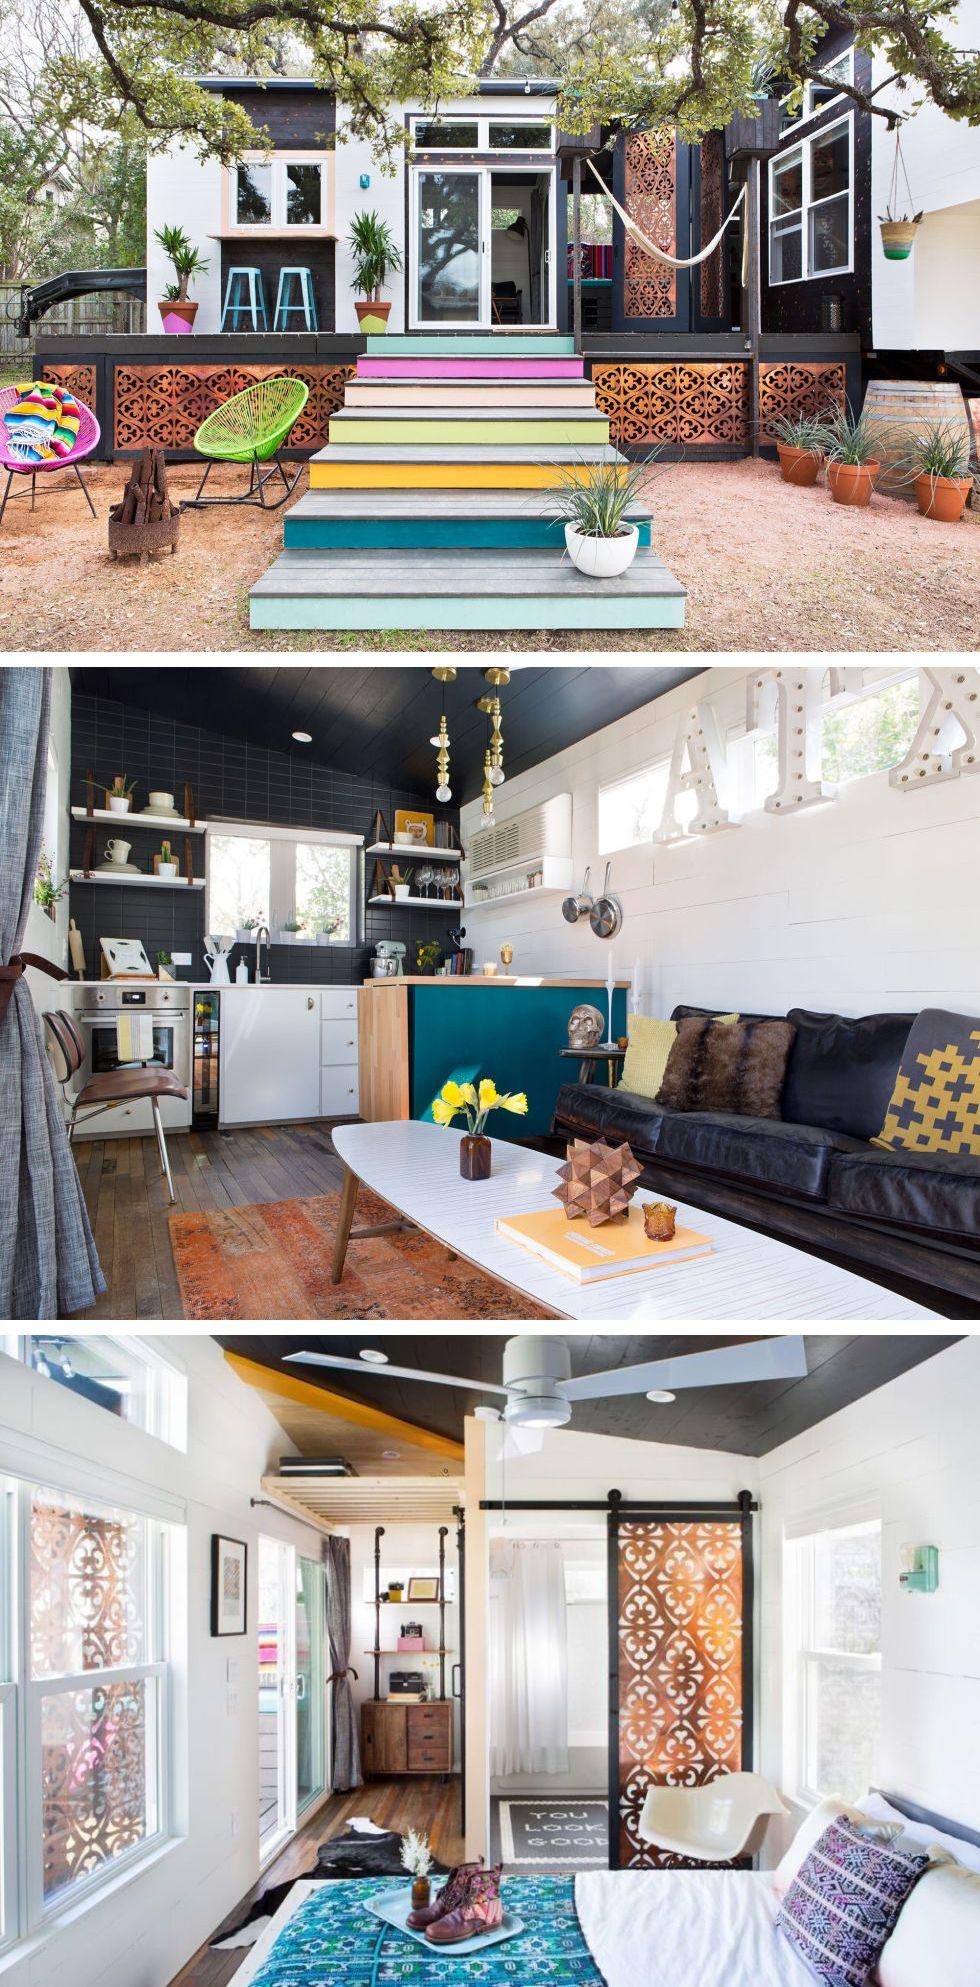 Take A Peek Inside Austin S Most Colorful 400 Square Foot Home Tiny House Nation Tiny House Inspiration Tiny House Living